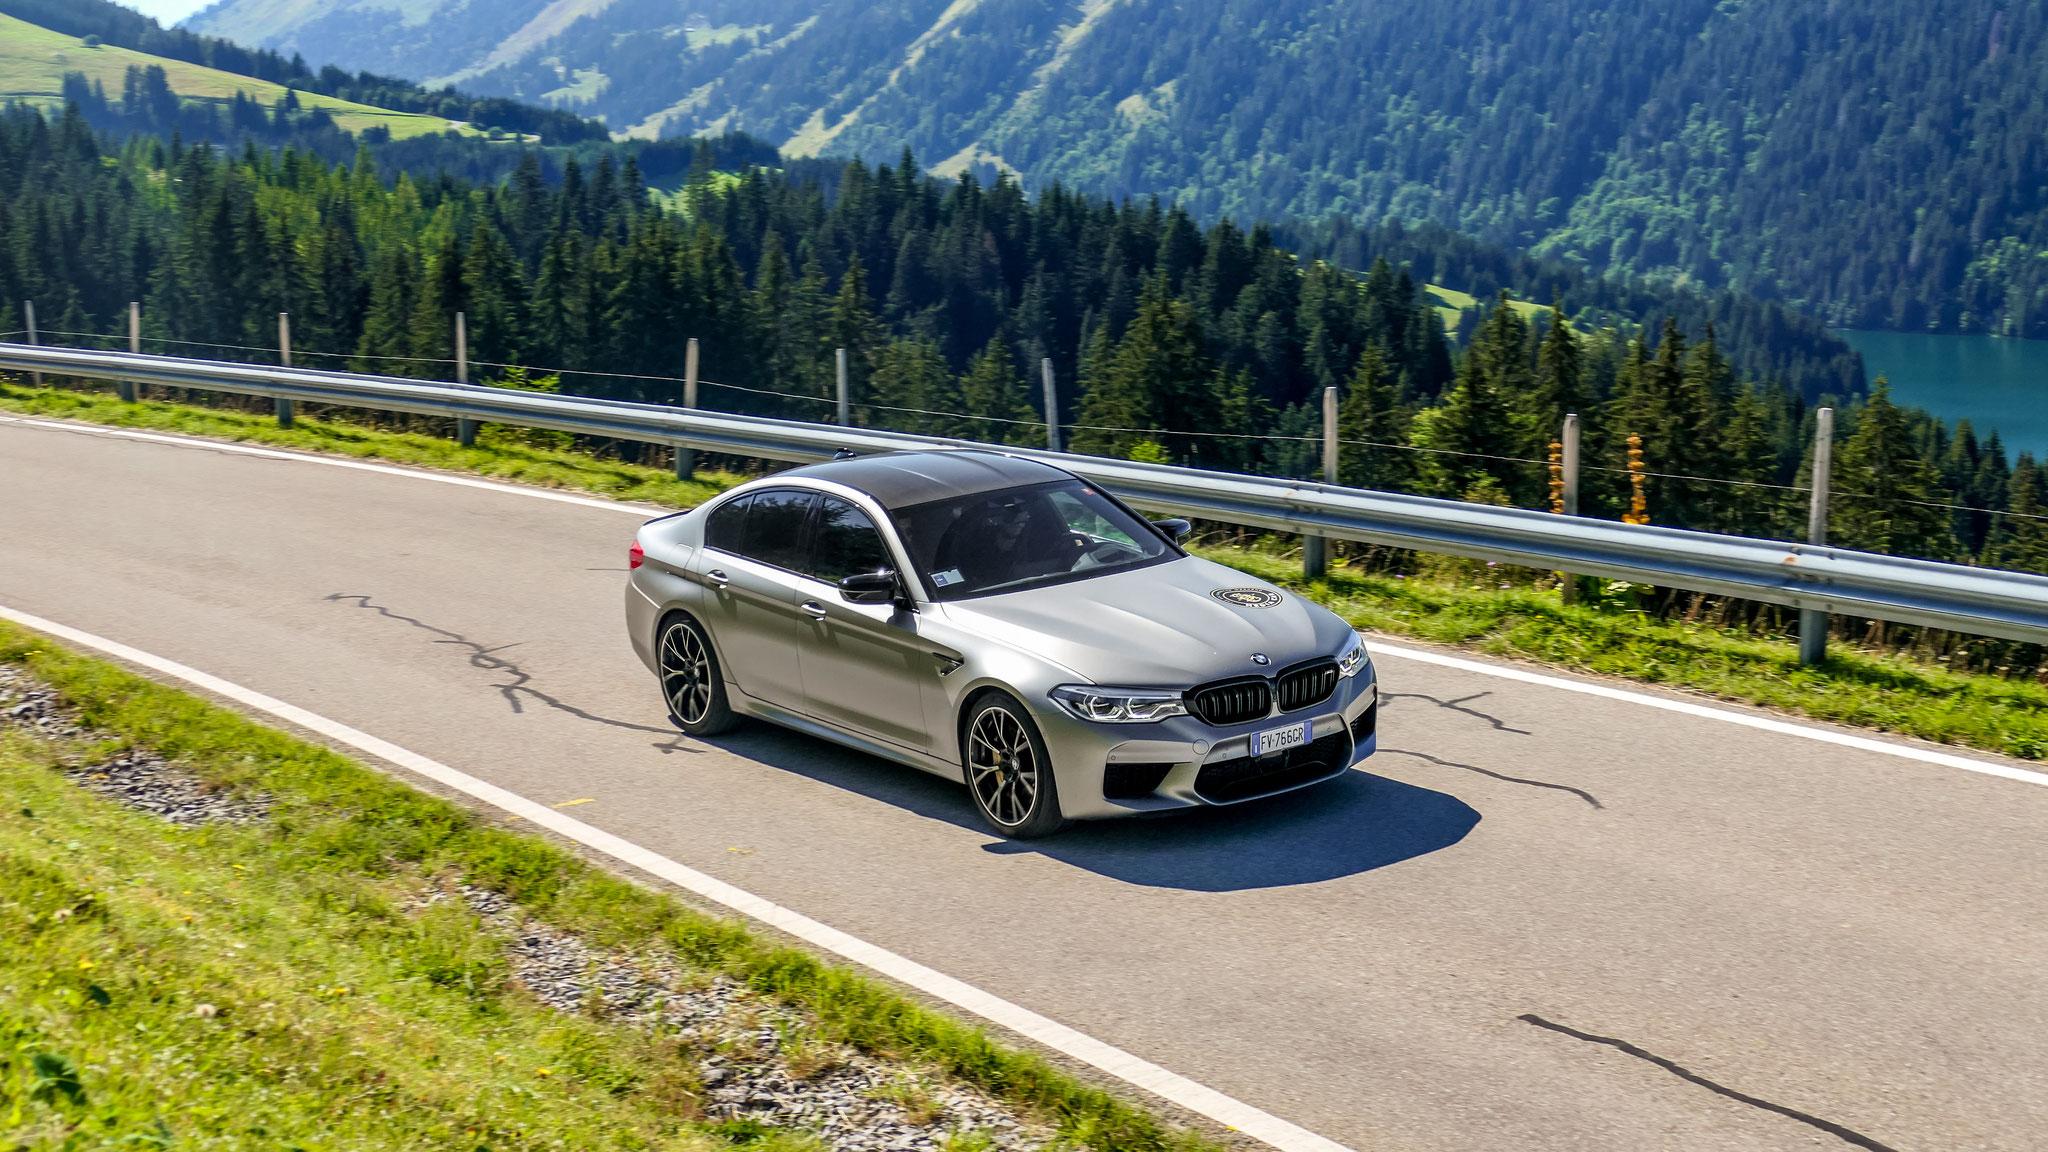 BMW M5 - FV-766-CR (ITA)